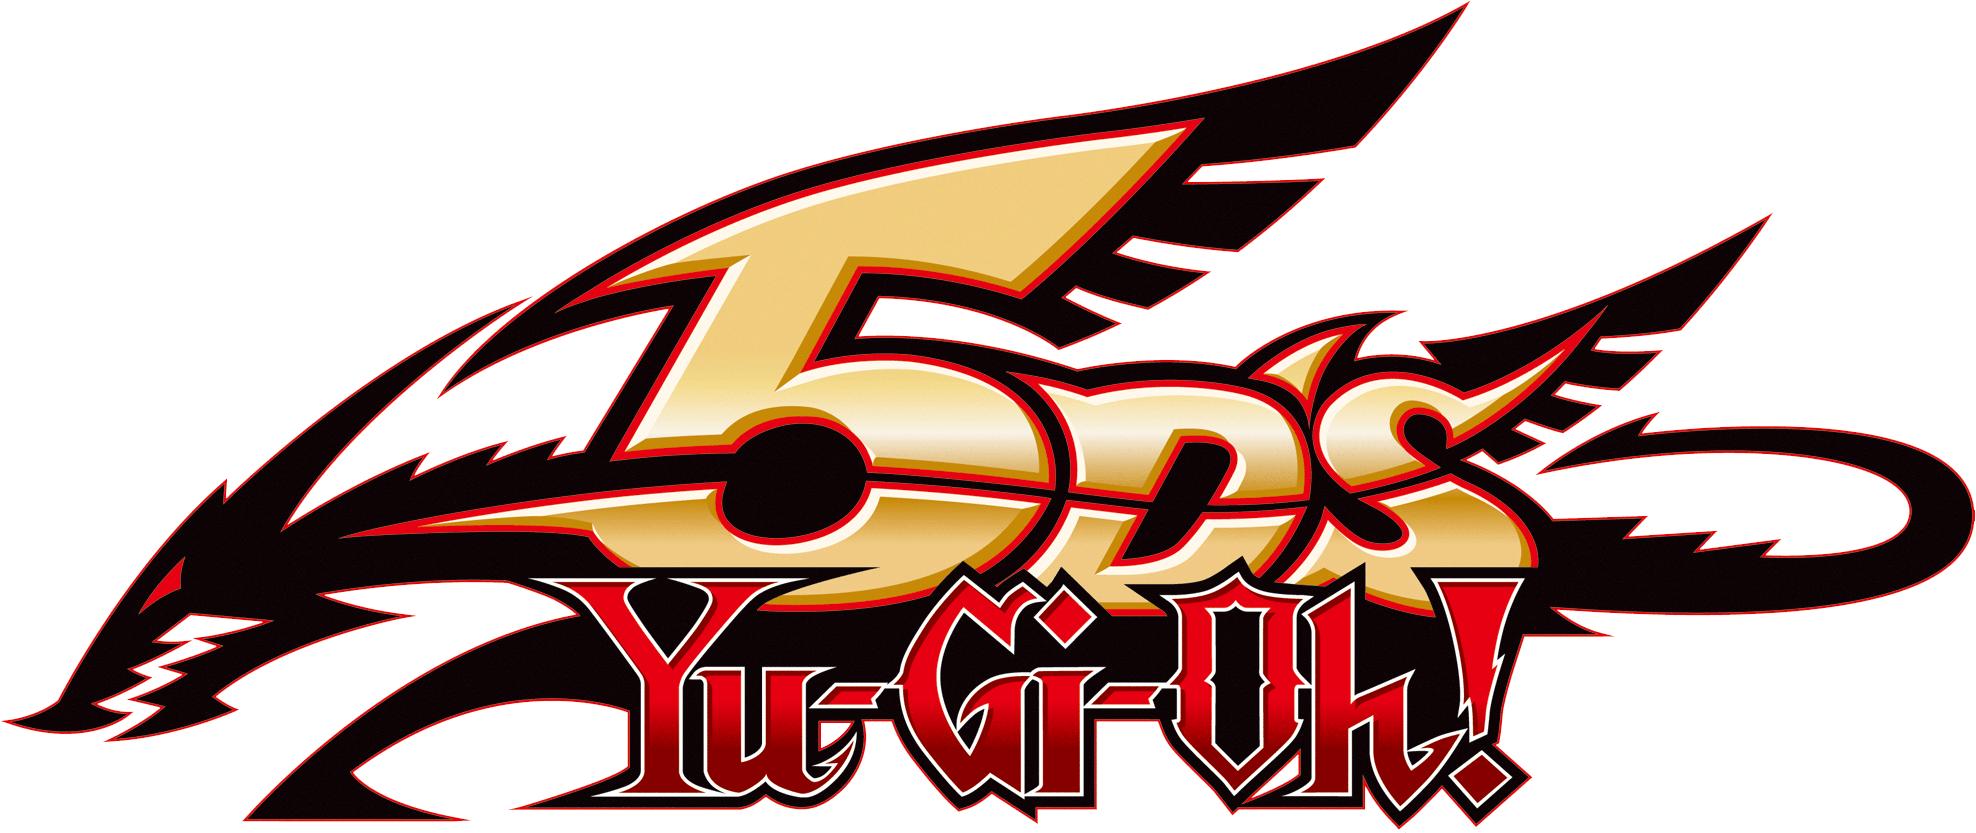 YuGiOh 5Ds  YuGiOh  FANDOM powered by Wikia